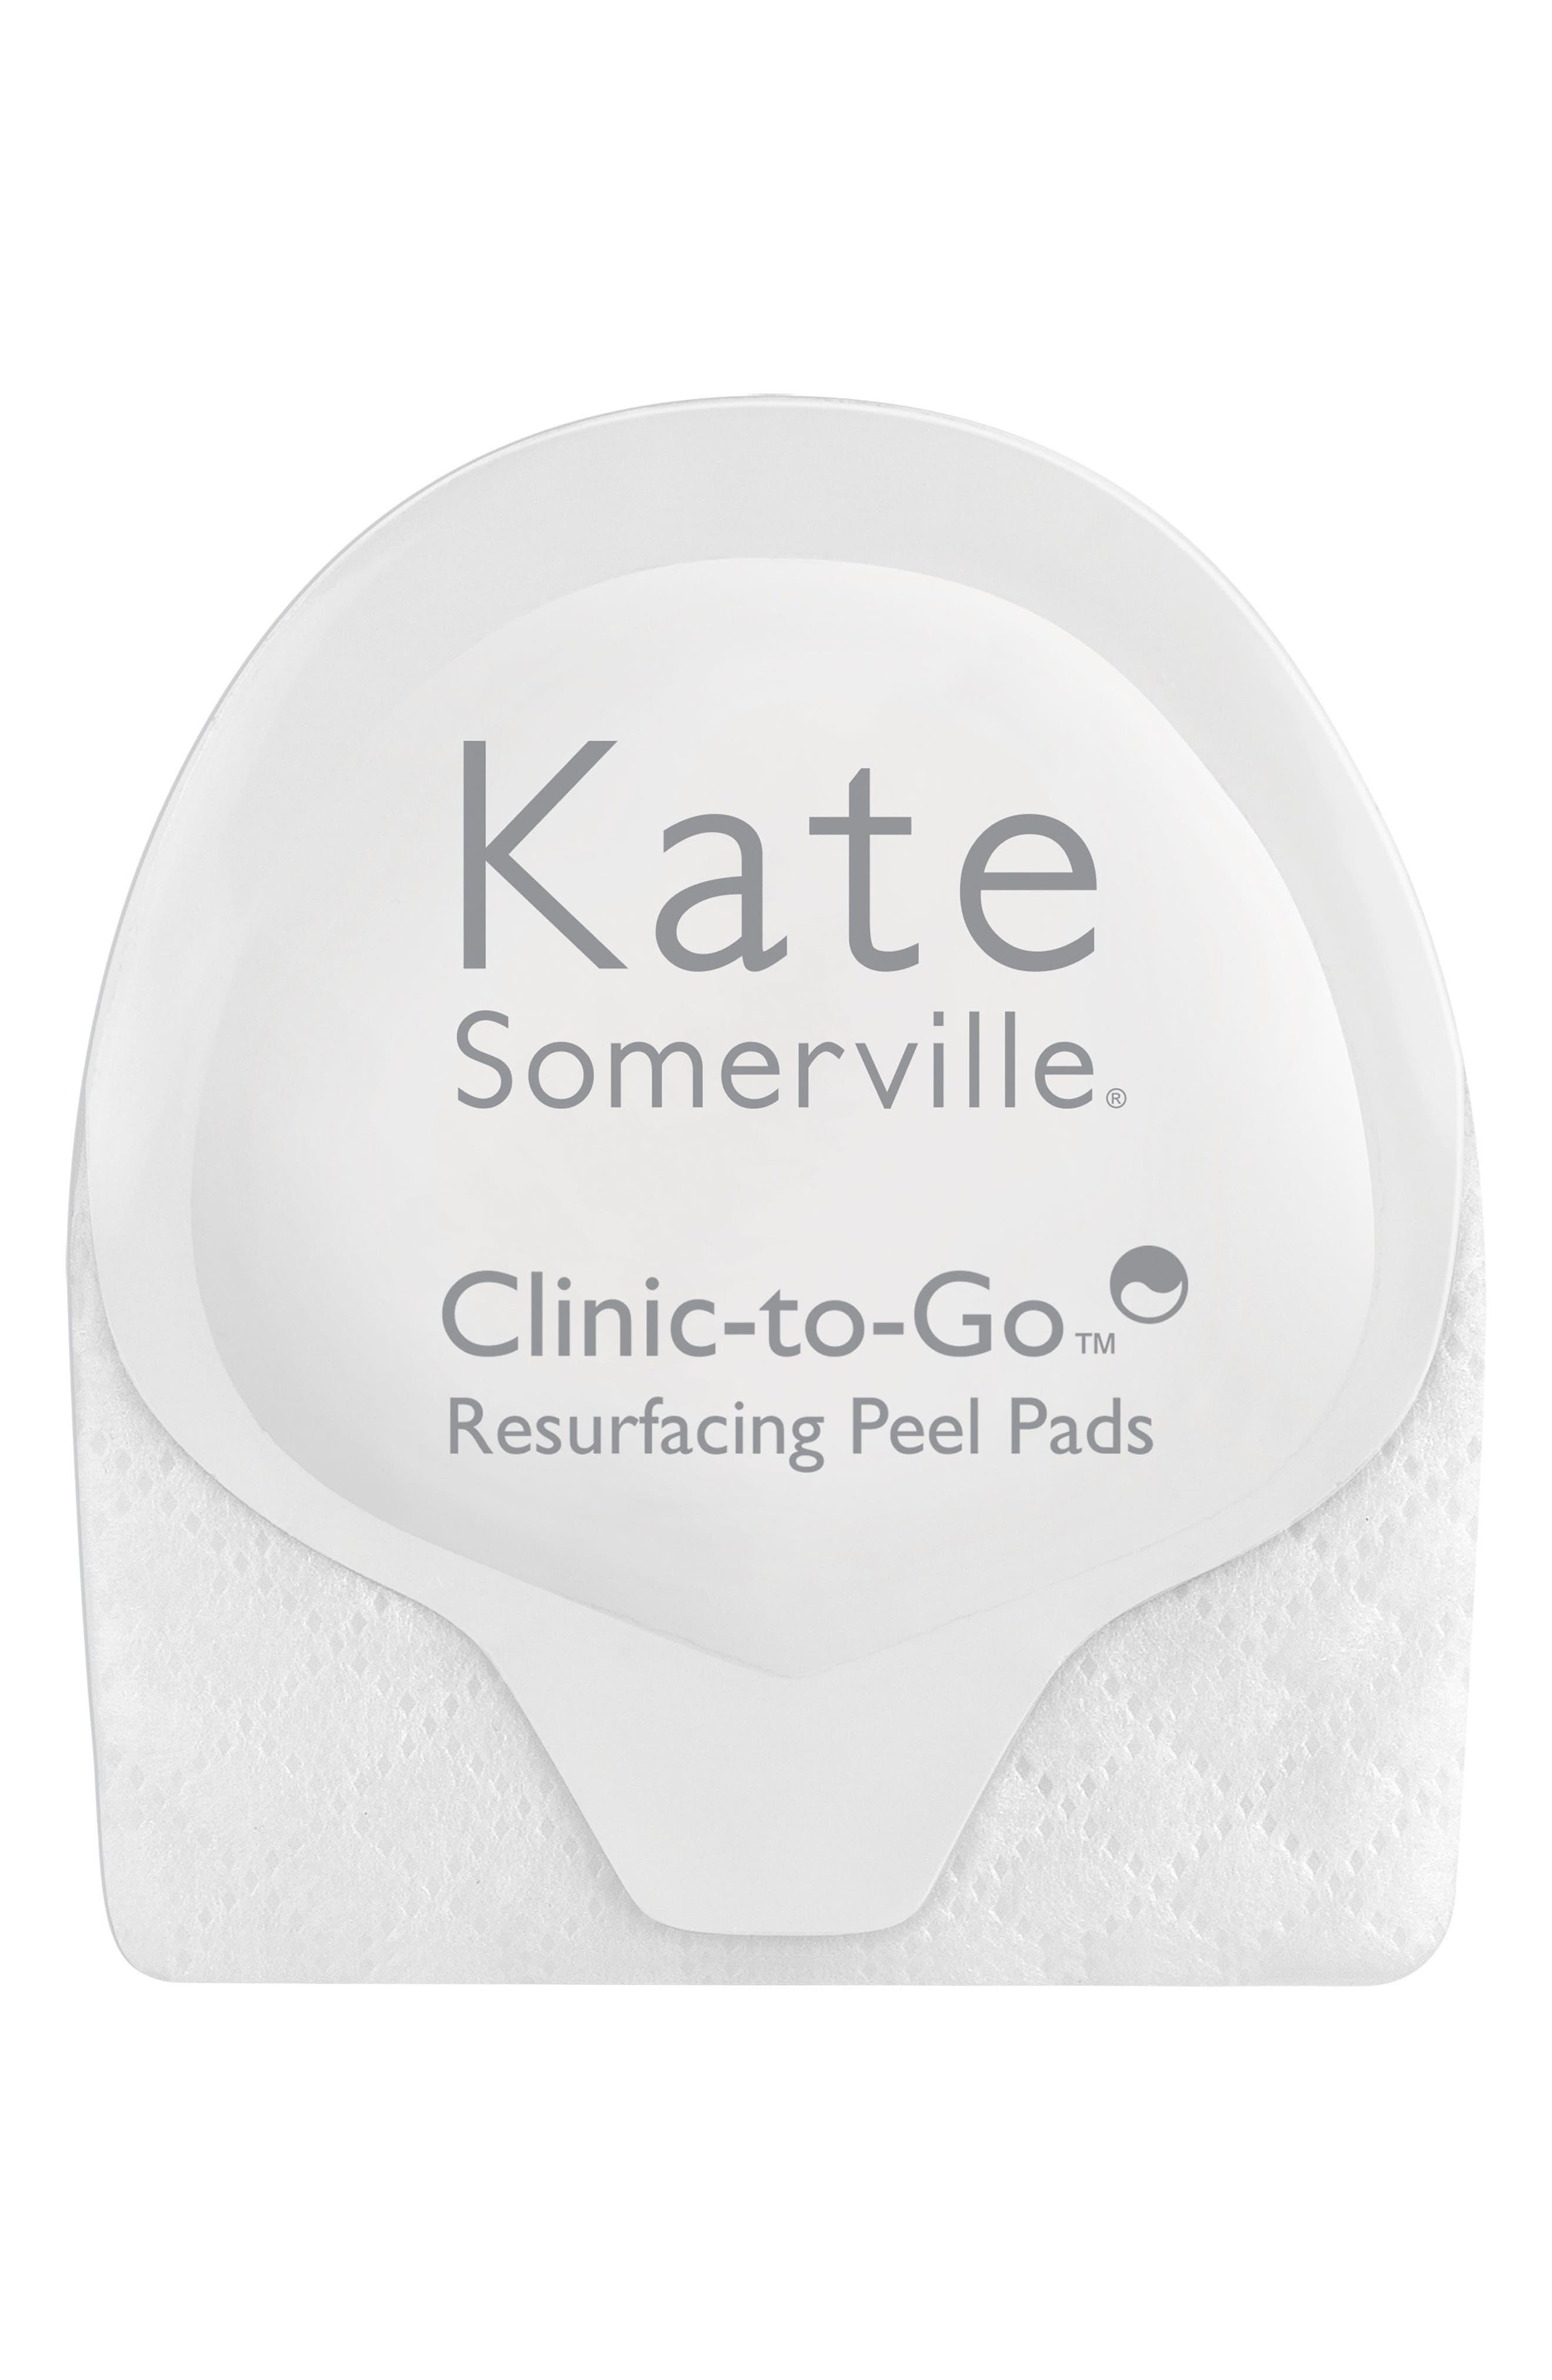 'Clinic-to-Go' Resurfacing Peel Pads,                             Main thumbnail 1, color,                             000